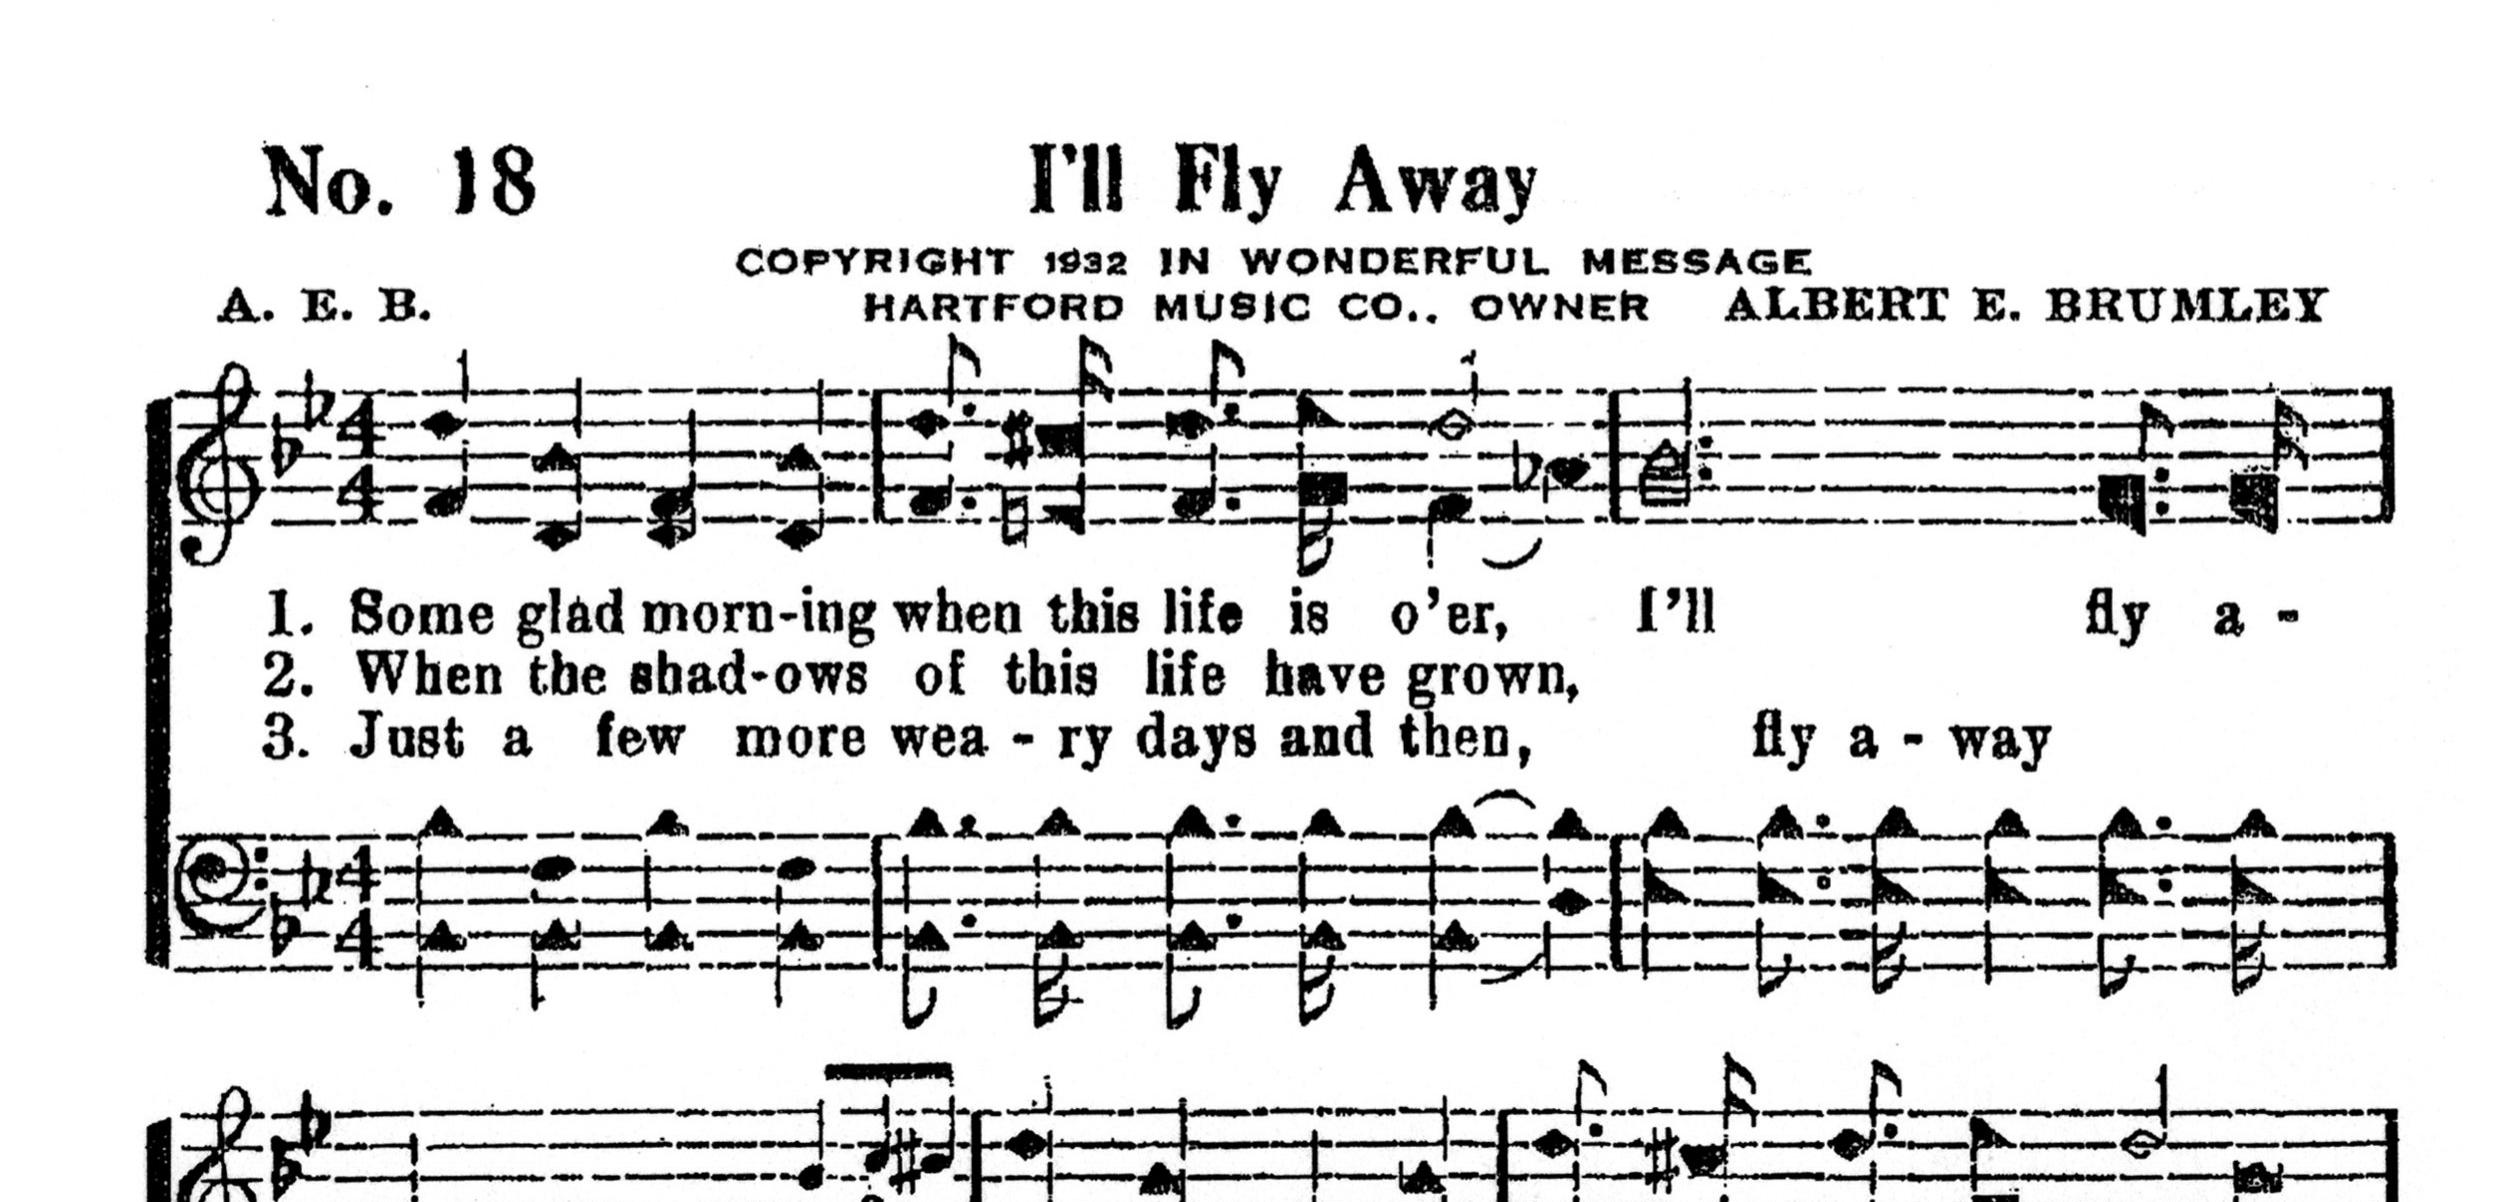 Fig. 1.   The Wonderful Message  (1932), excerpt. ©1960 Albert E. Brumley & Sons.